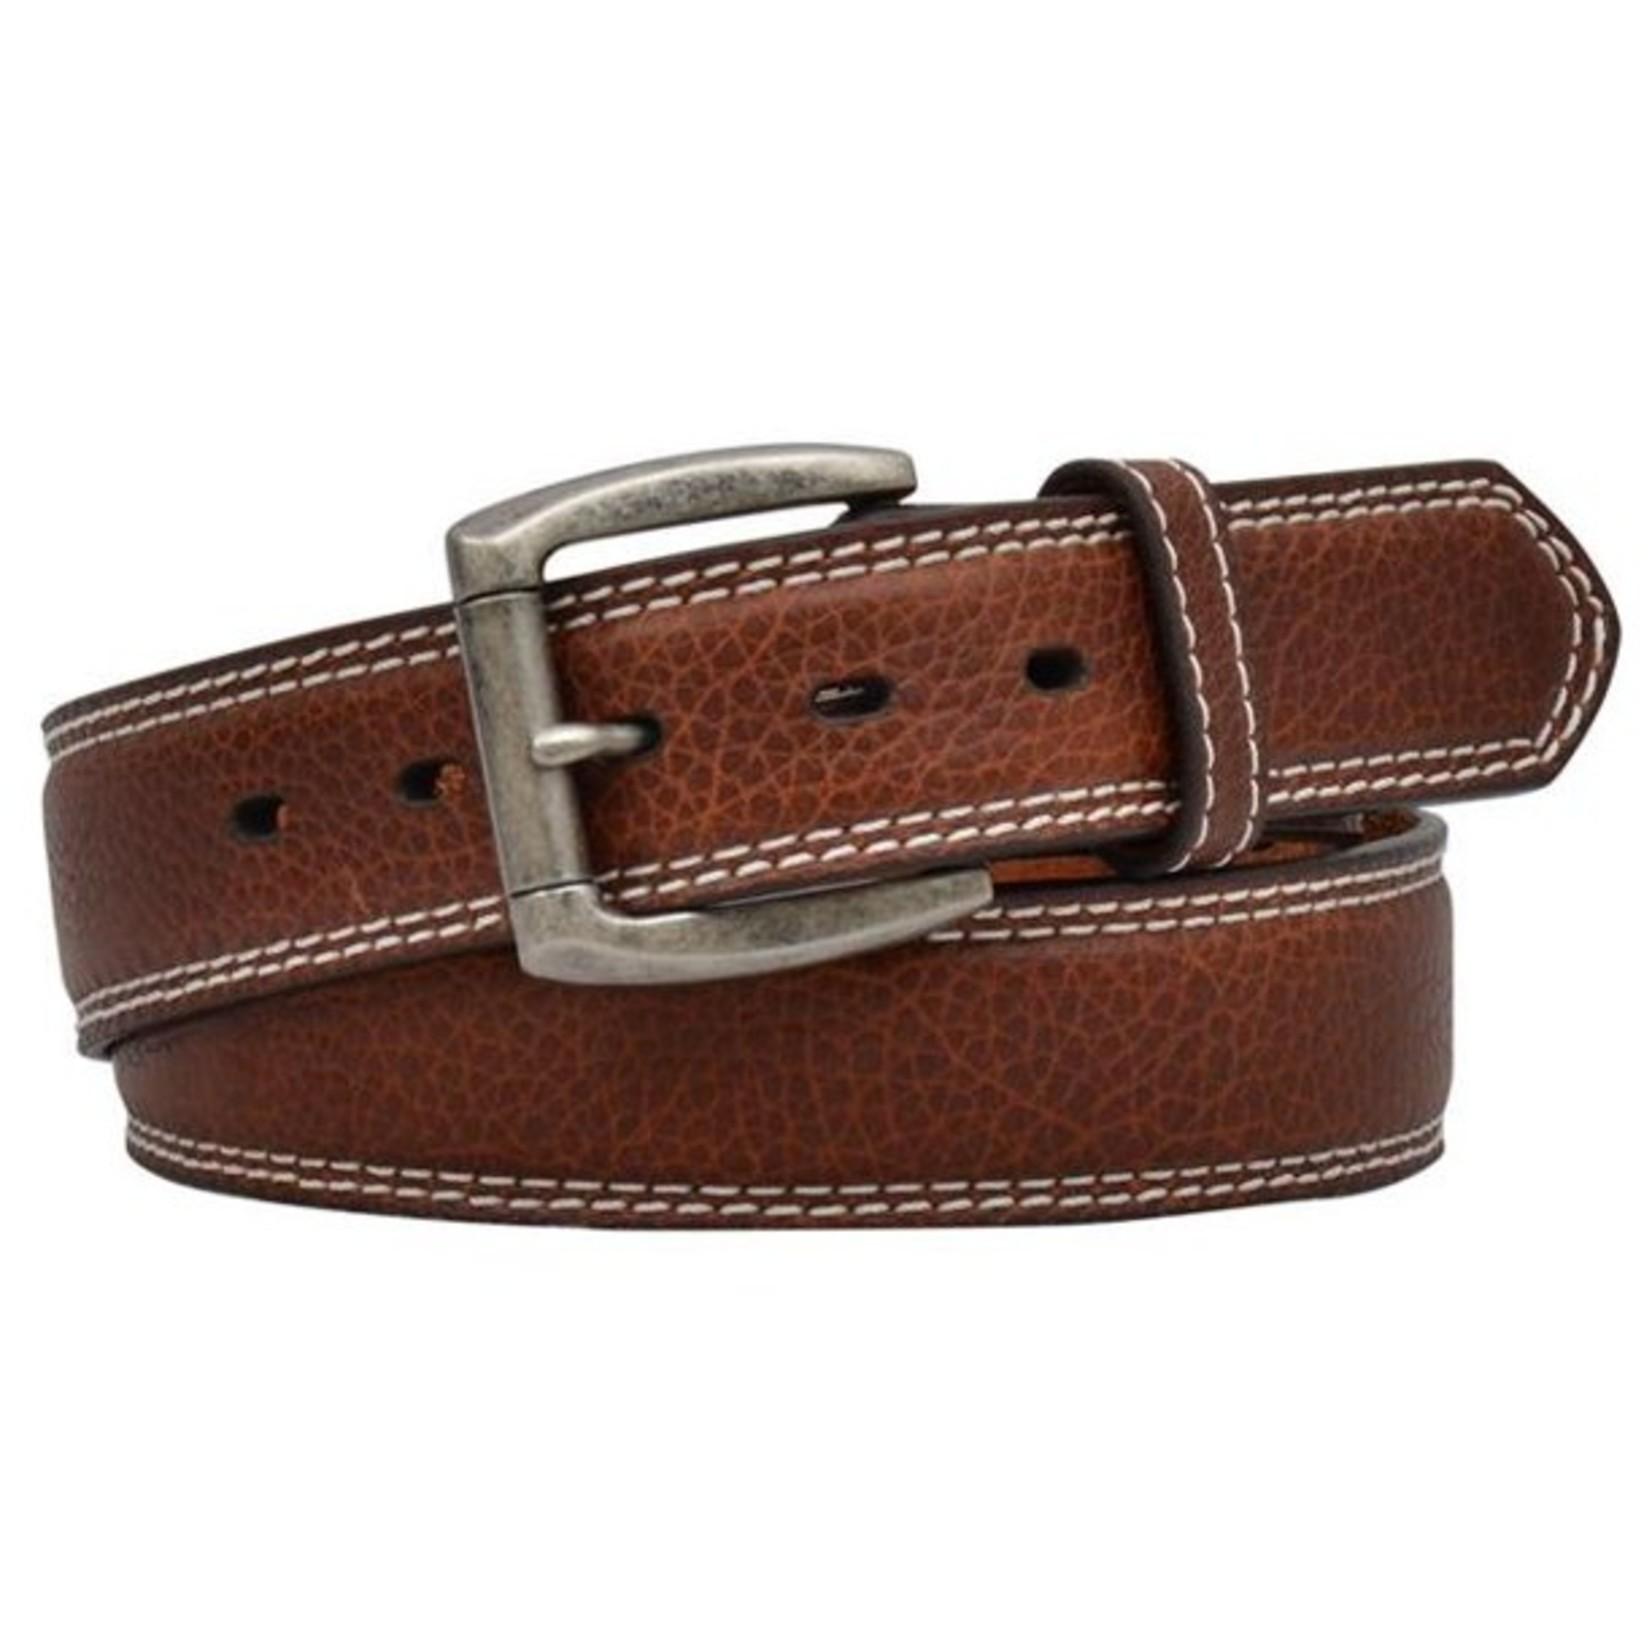 3D Watertown Amber Double Stitch Belt Brown D1199